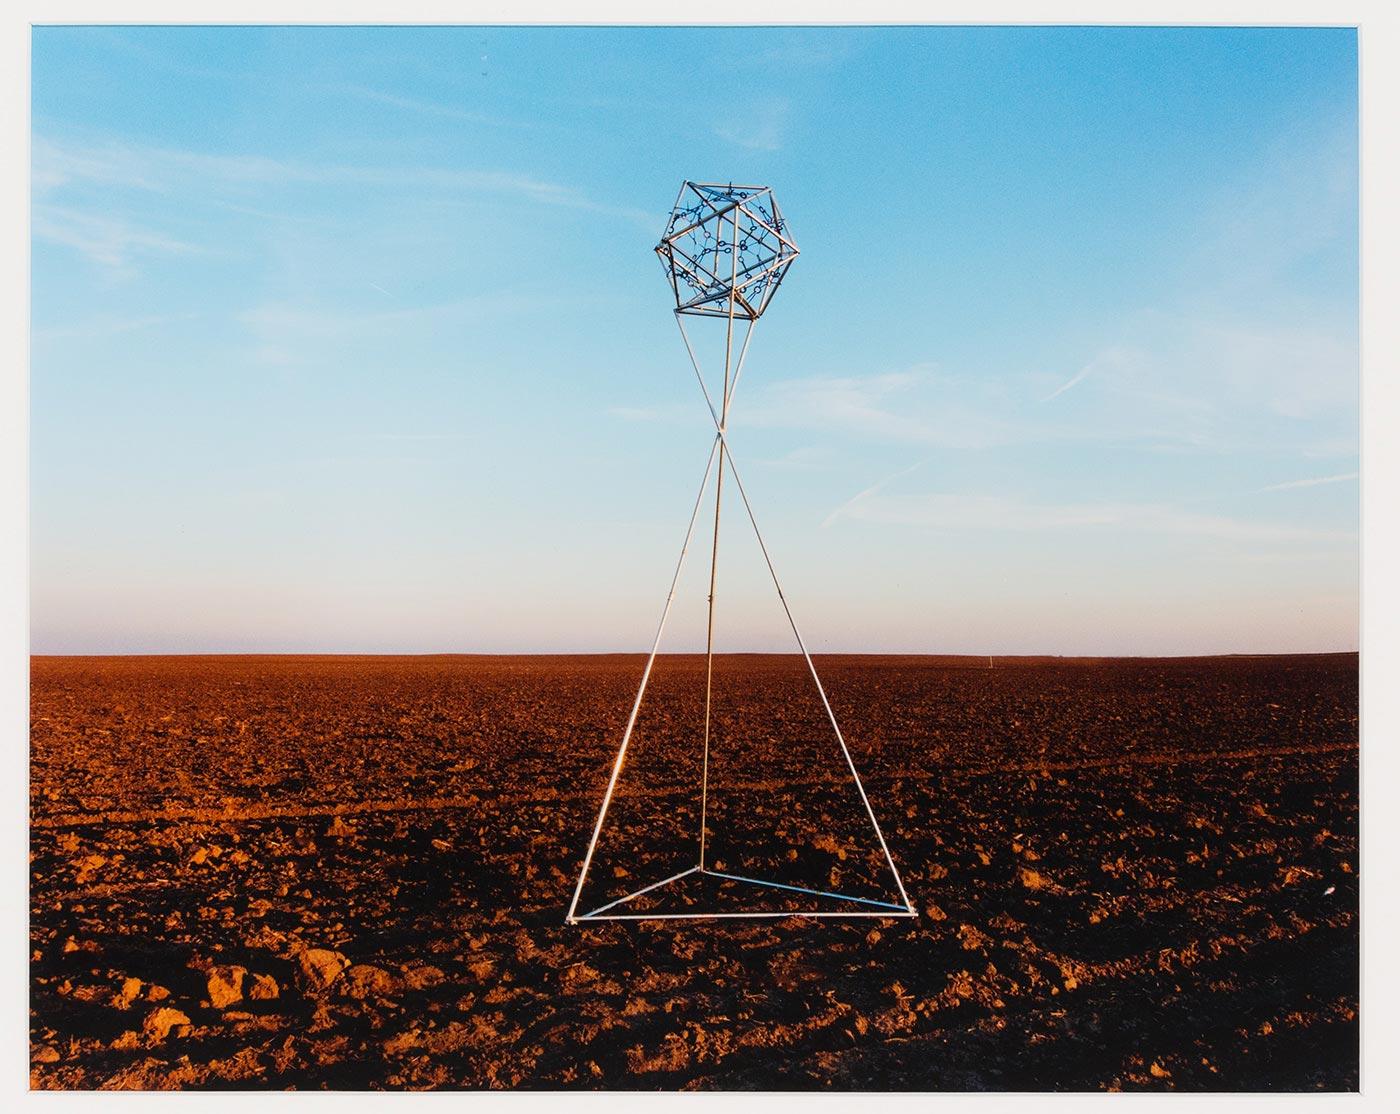 Travis Hocutt - Micrometeorite Collector, Illinois